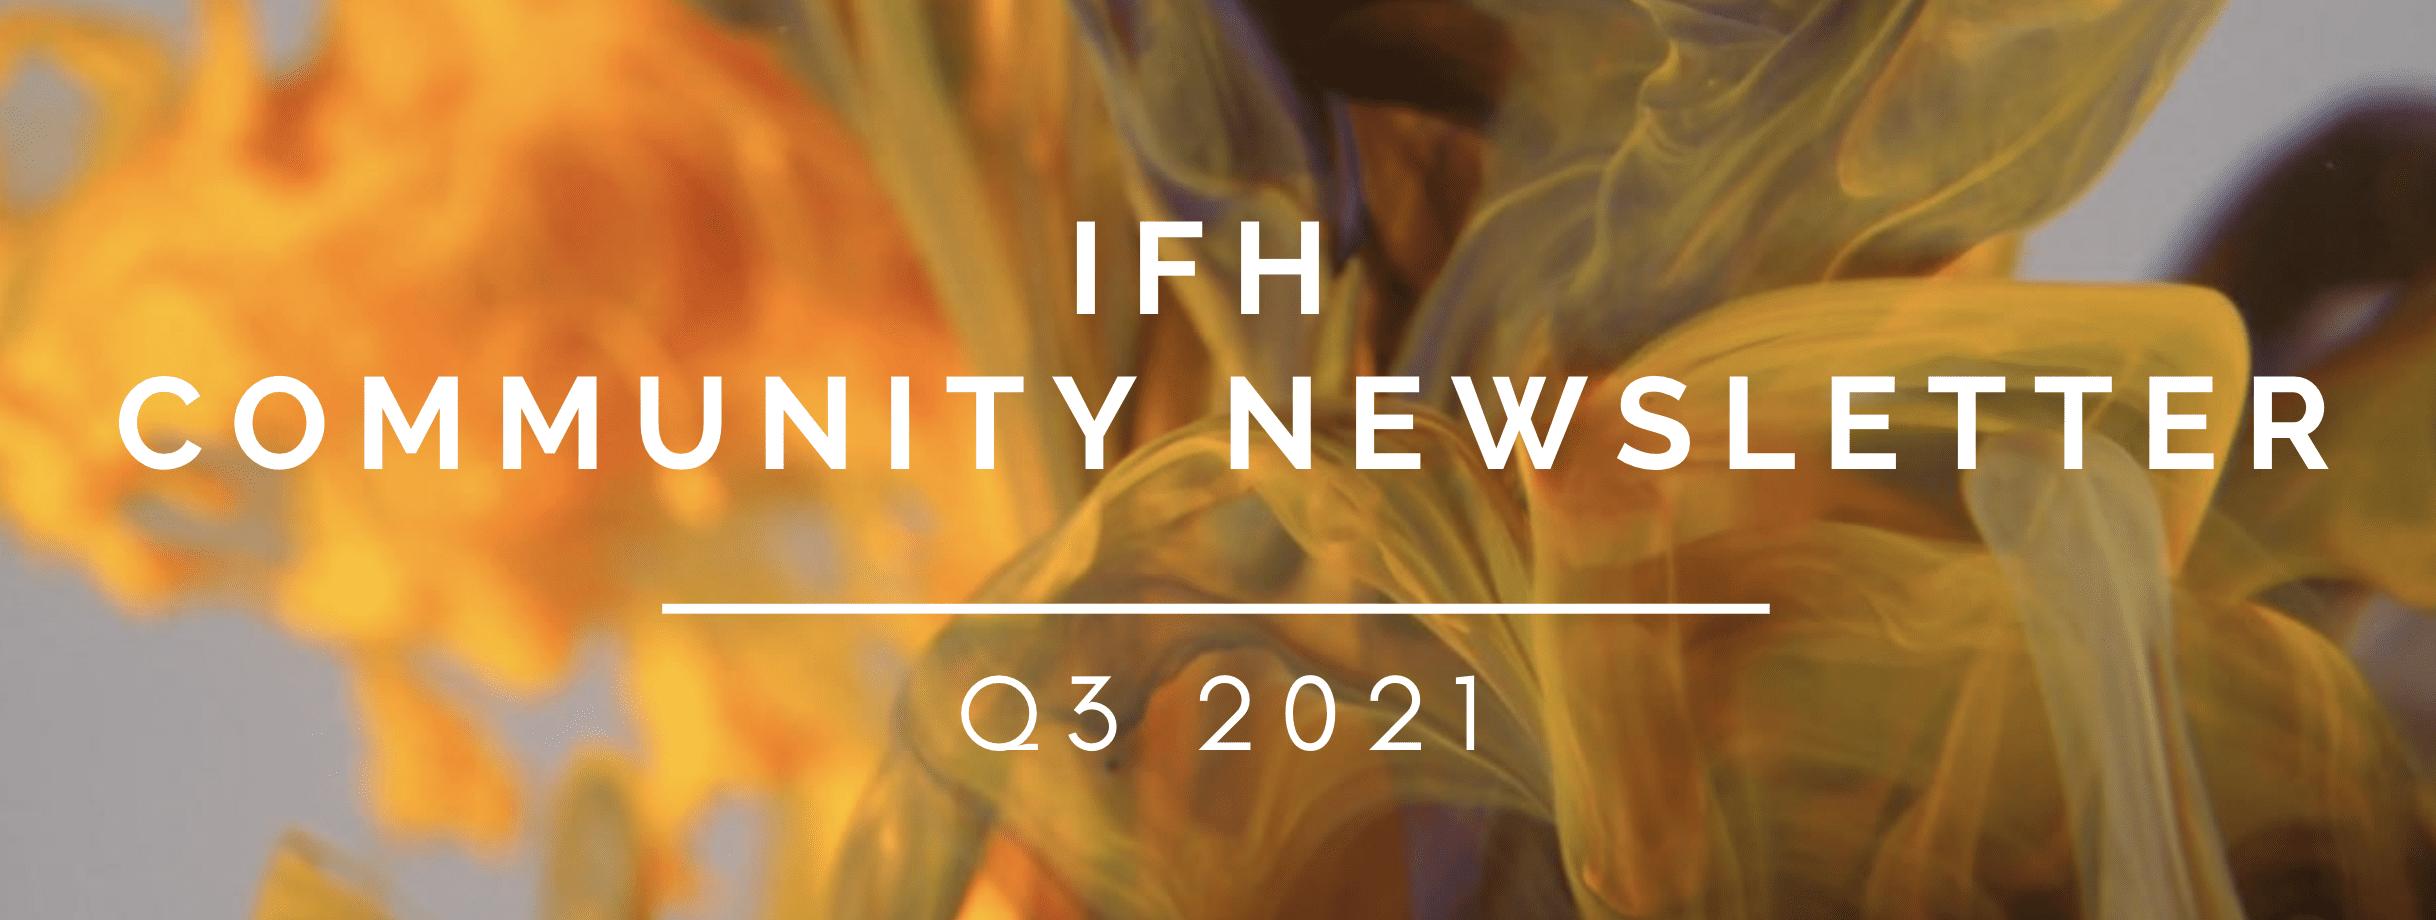 IFH Community Newsletter Q3